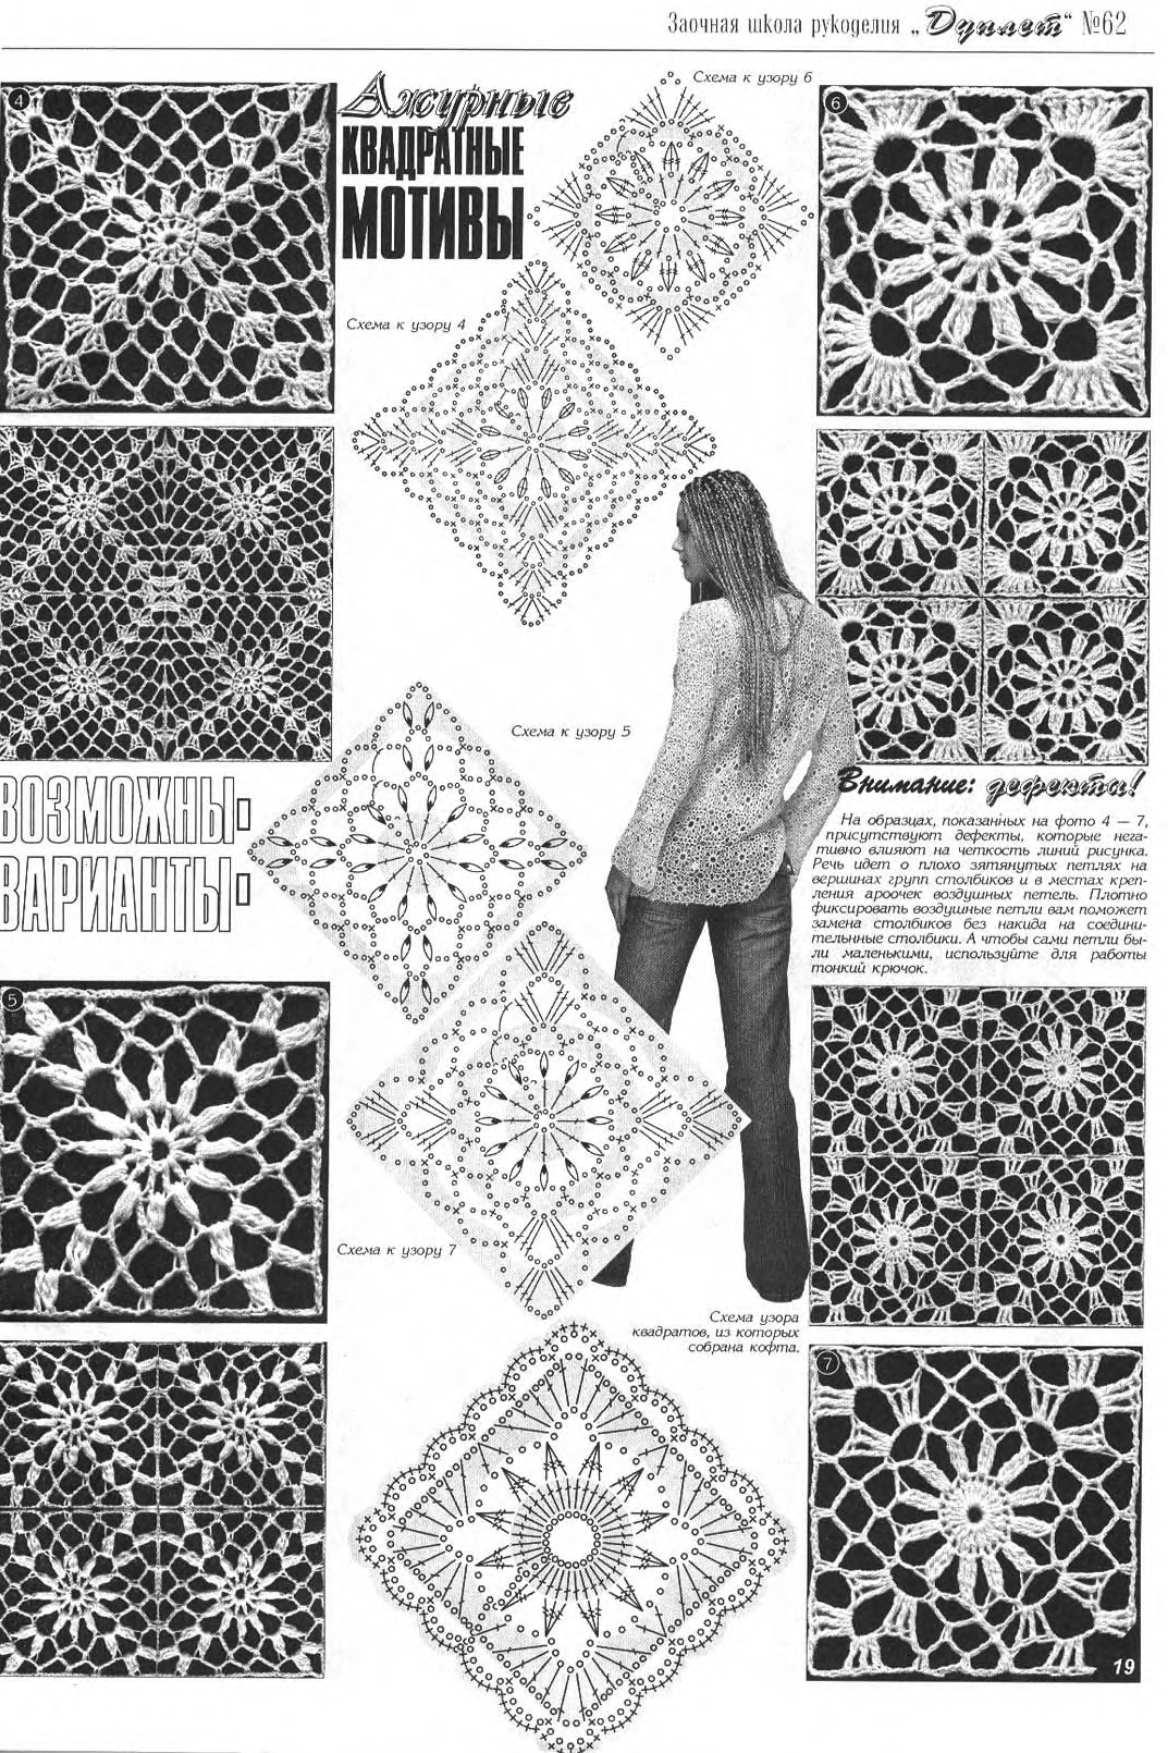 crochet square motif diagram pattern database er for courier management system duplet 62 irish pinterest squares